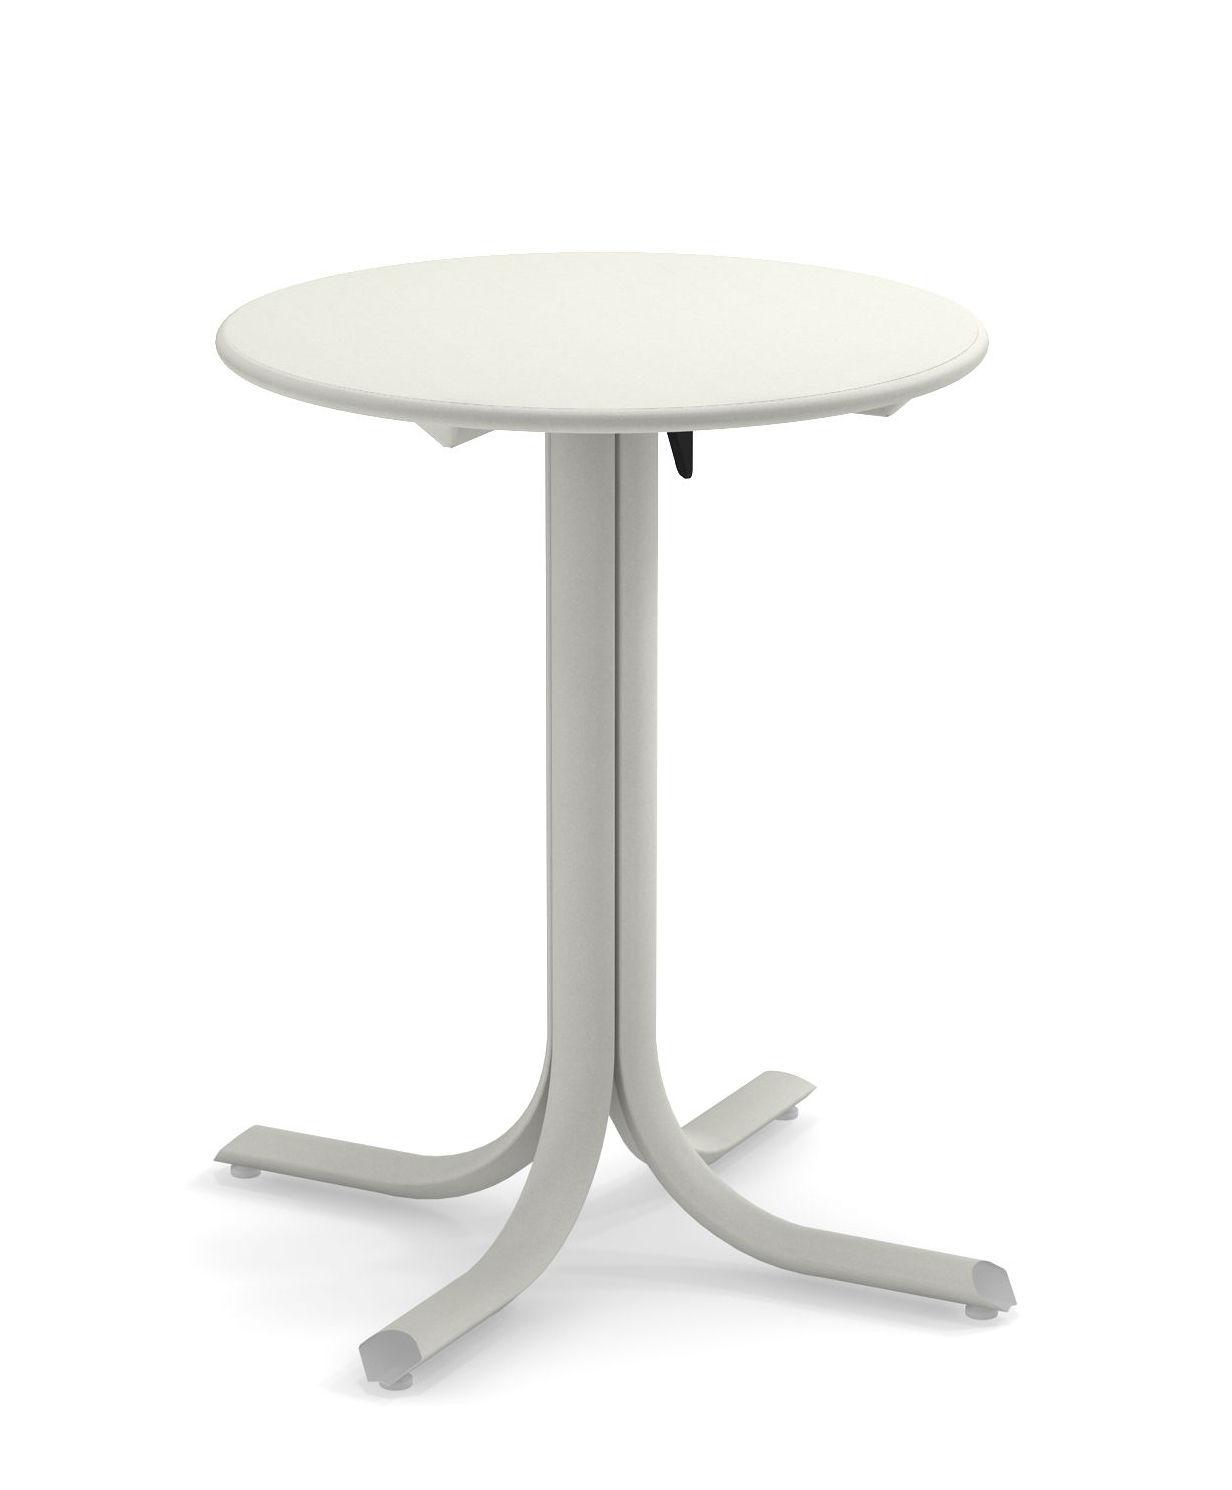 Outdoor - Tables de jardin - Table pliante System / Ø 60 cm - Emu - Blanc - Acier peint galvanisé